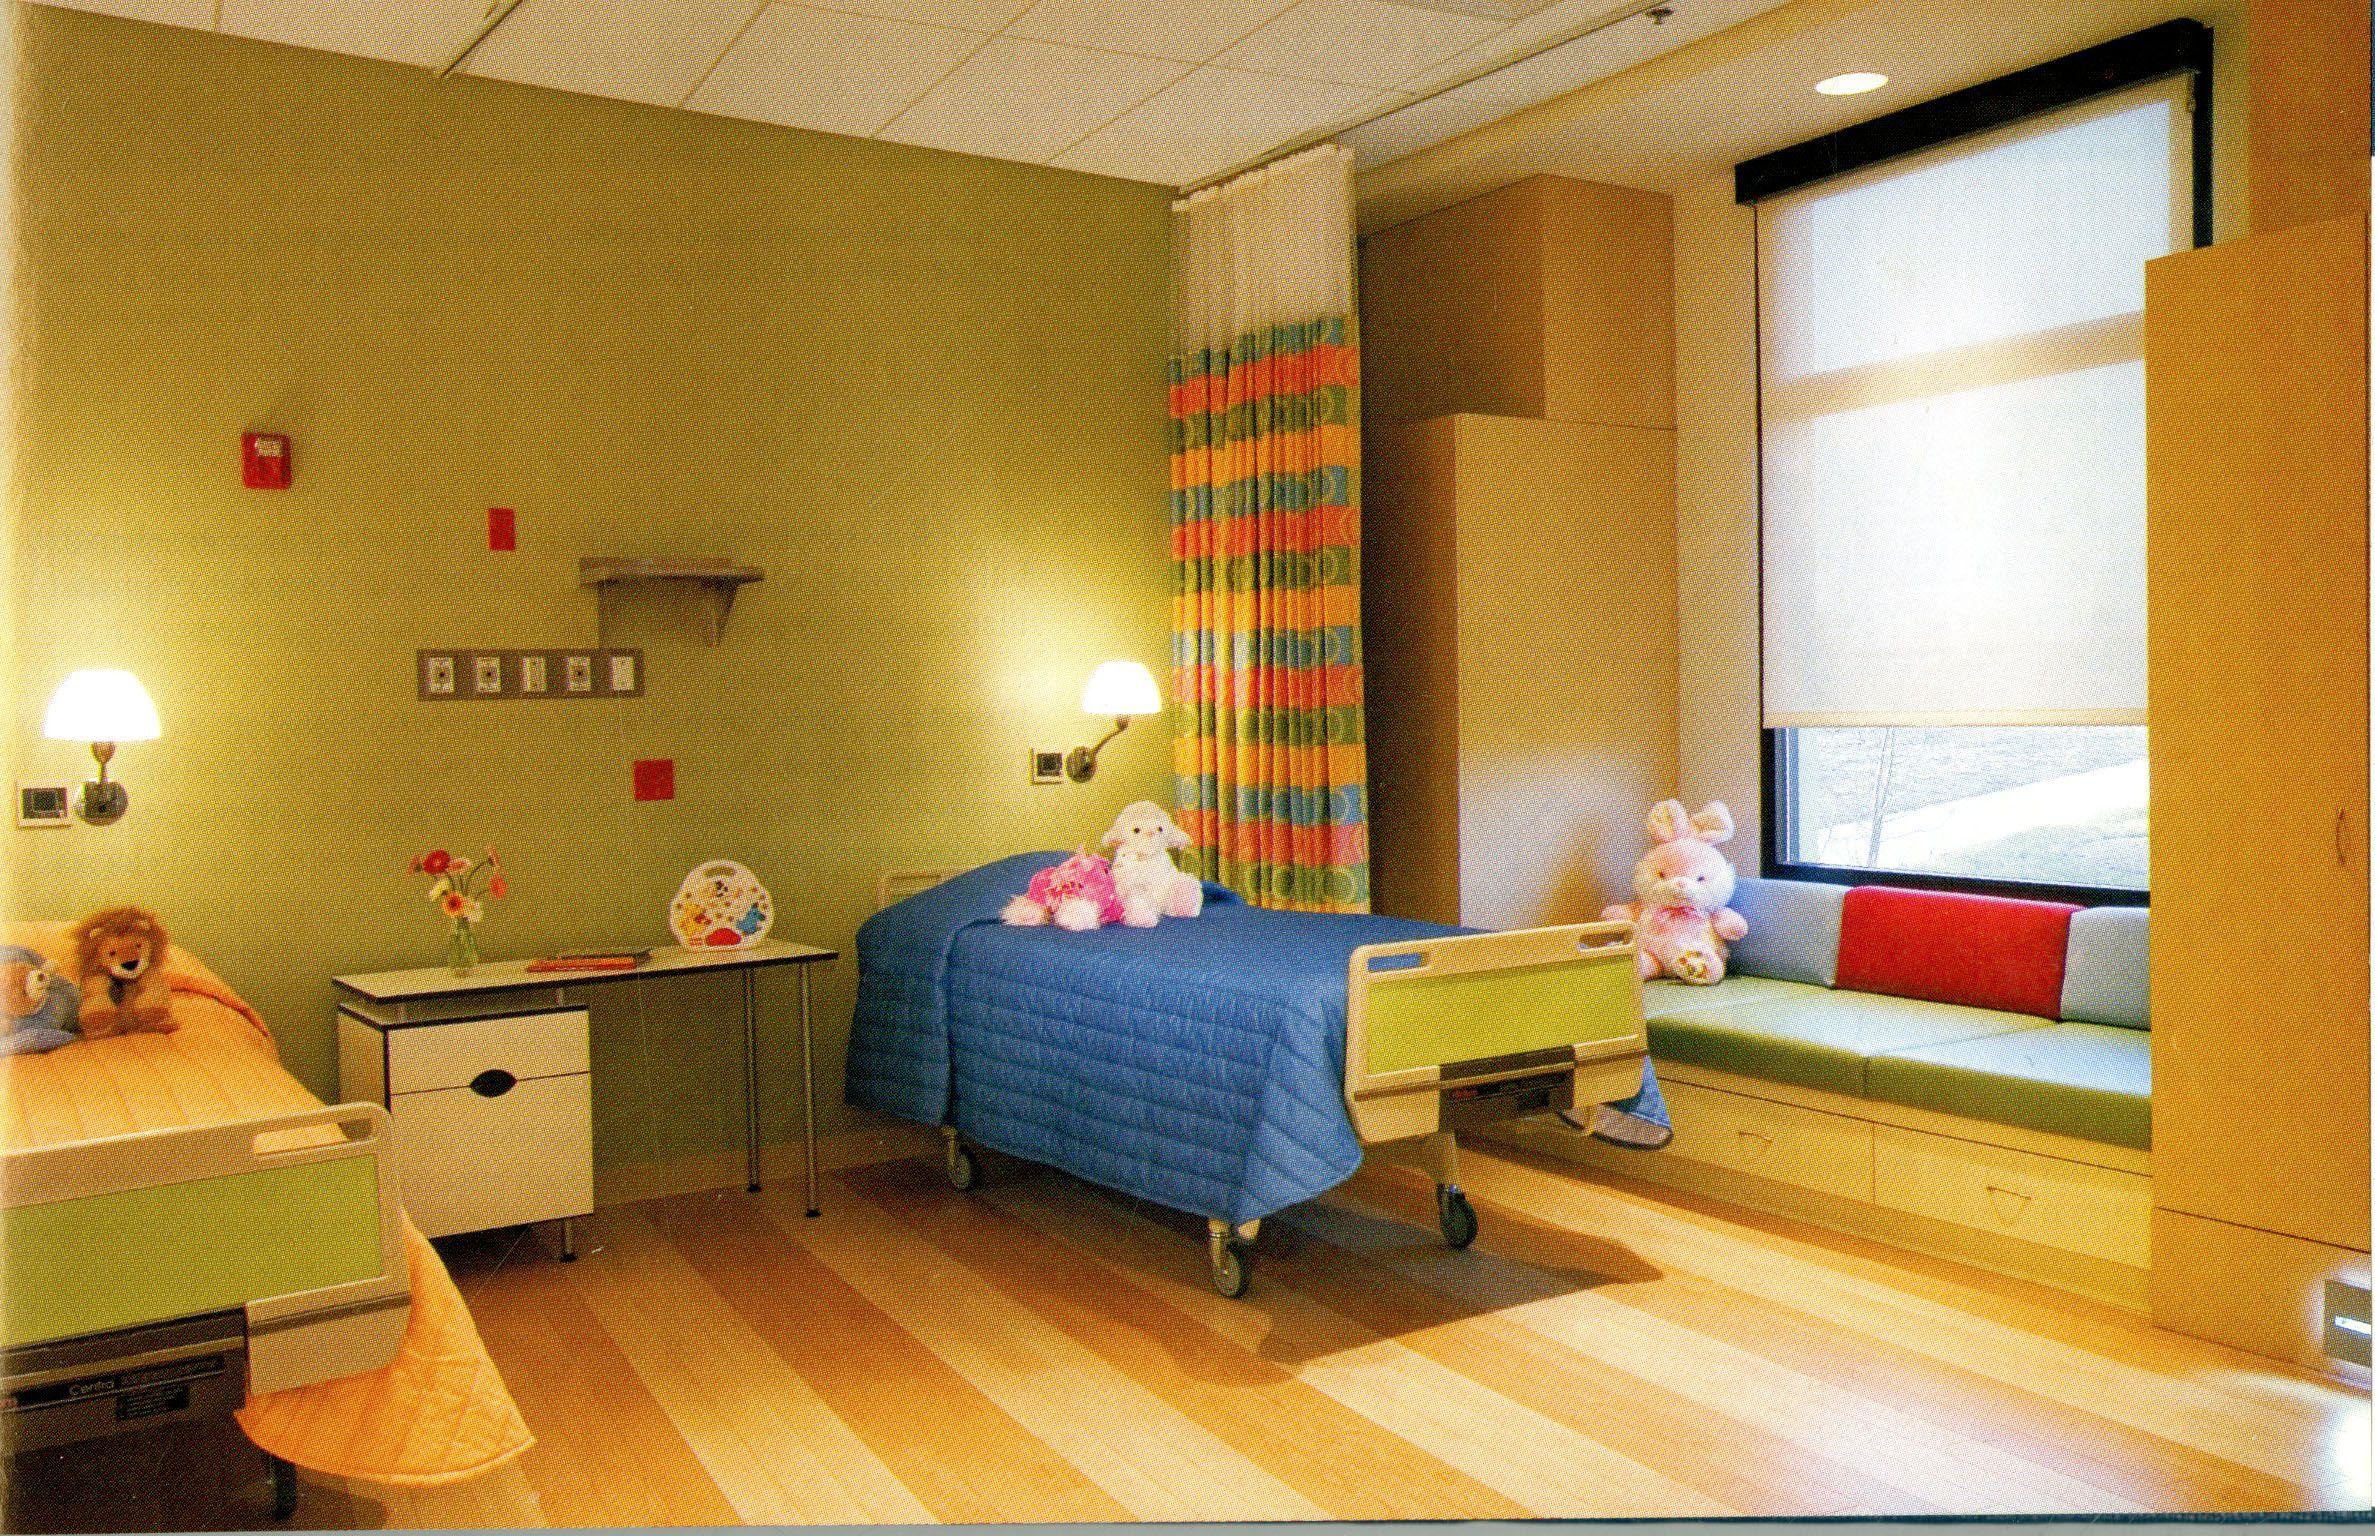 Patient rooms hospital design room environmental design